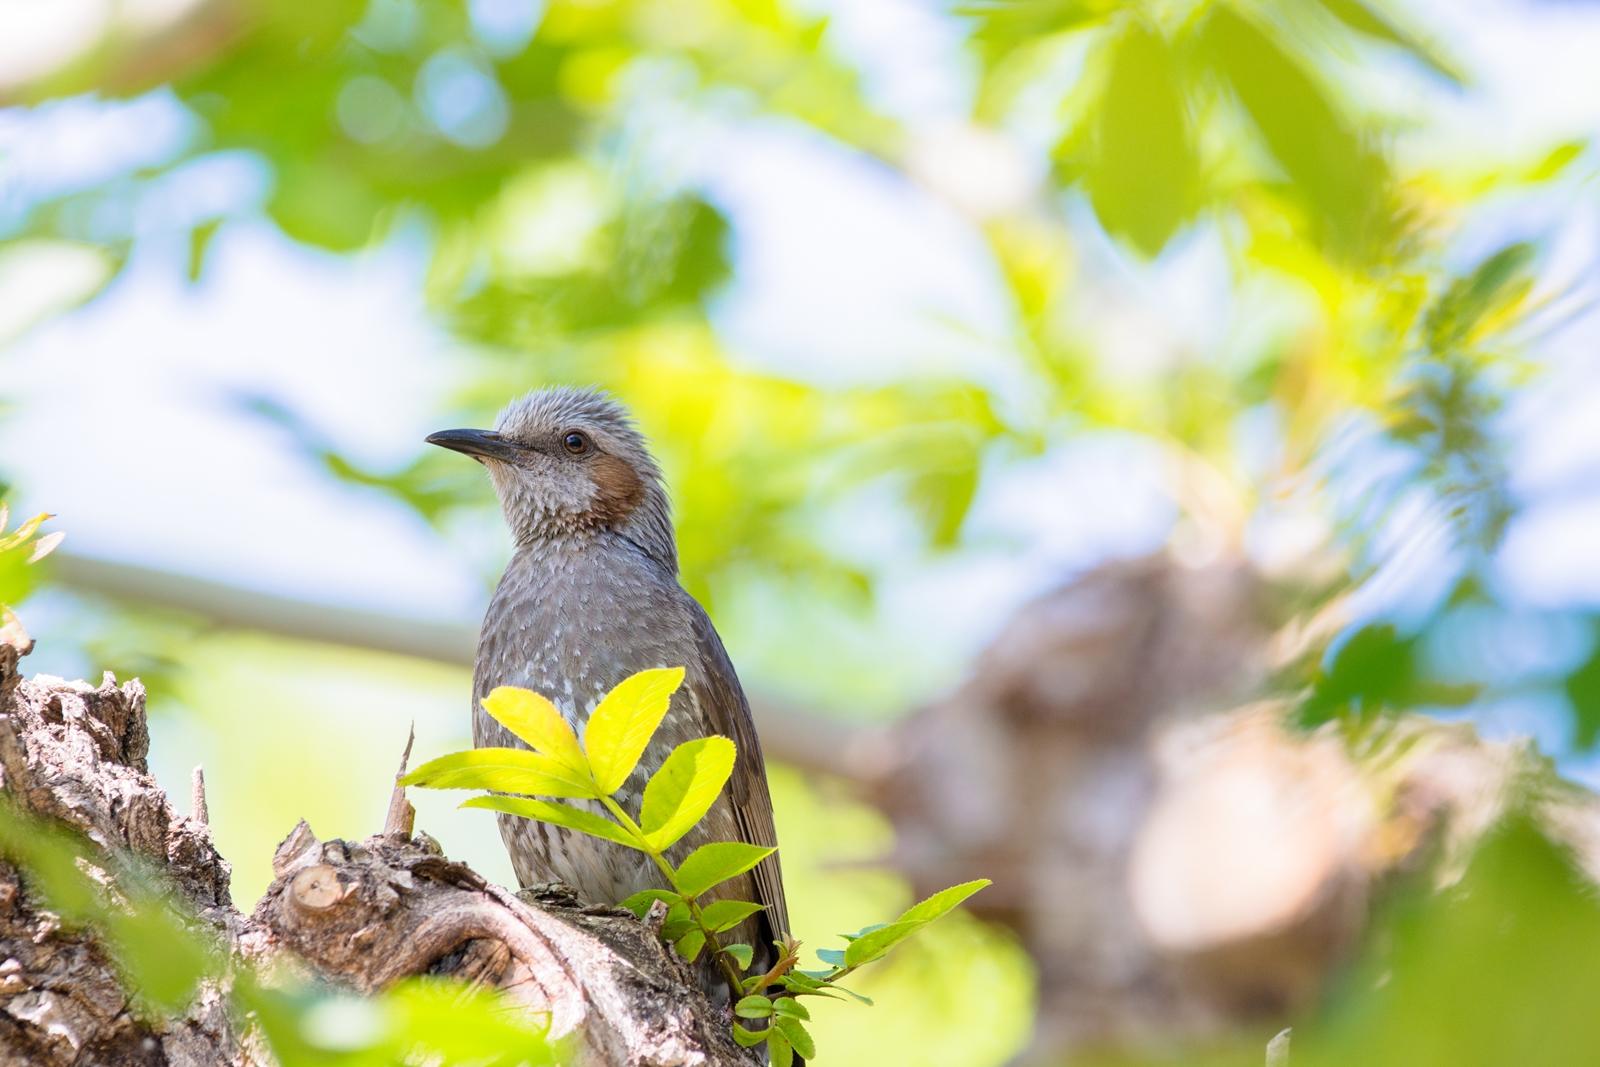 Photo: 「変わっていく色」 / Changing of the green season.  毎日見てるよ 少しずつ変わっていく君を 色濃さを増し 大きく成長していく君を  Brown-eared Bulbul. (ヒヨドリ)  Nikon D7200 SIGMA 150-600mm F5-6.3 DG OS HSM Contemporary  #birdphotography #birds #kawaii #ことり #小鳥 #nikon #sigma  ( http://takafumiooshio.com/archives/2469 )